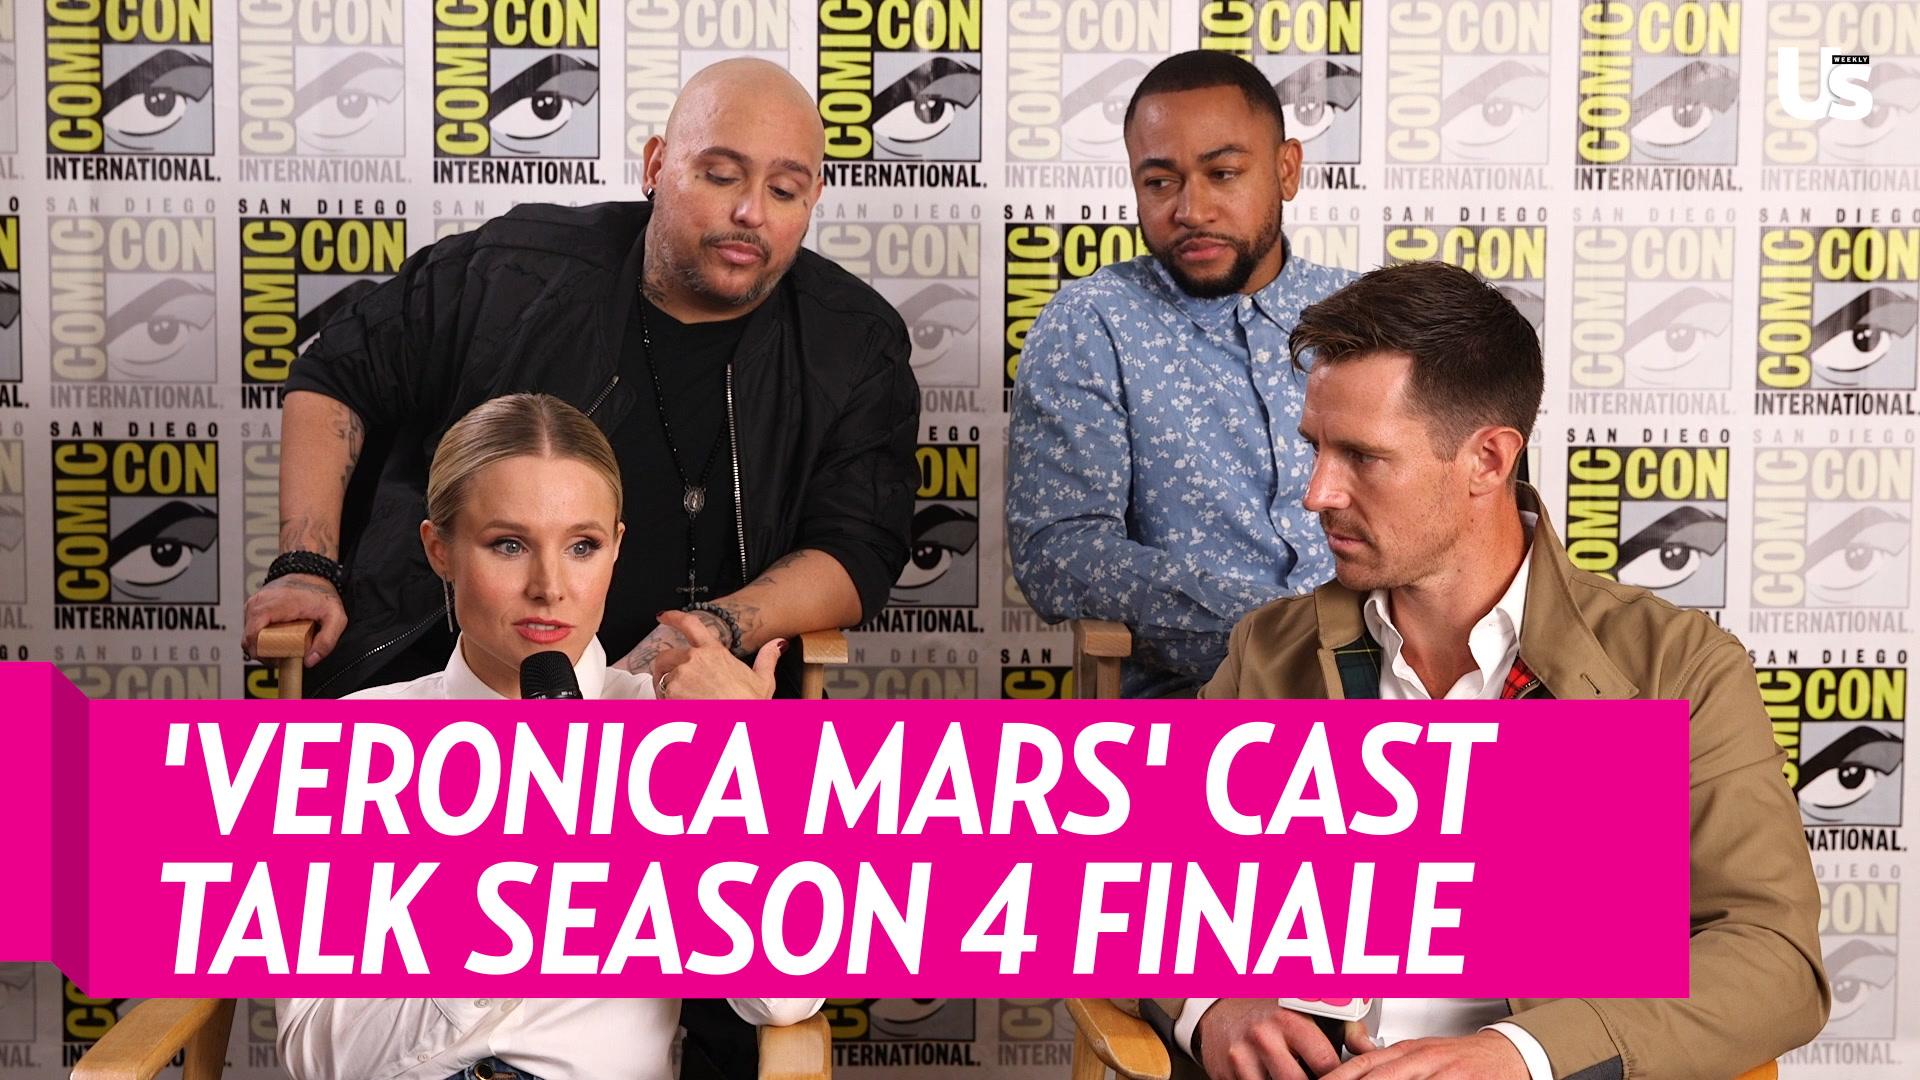 'Veronica Mars' Cast Break Down 'Devastating' Finale Shocker